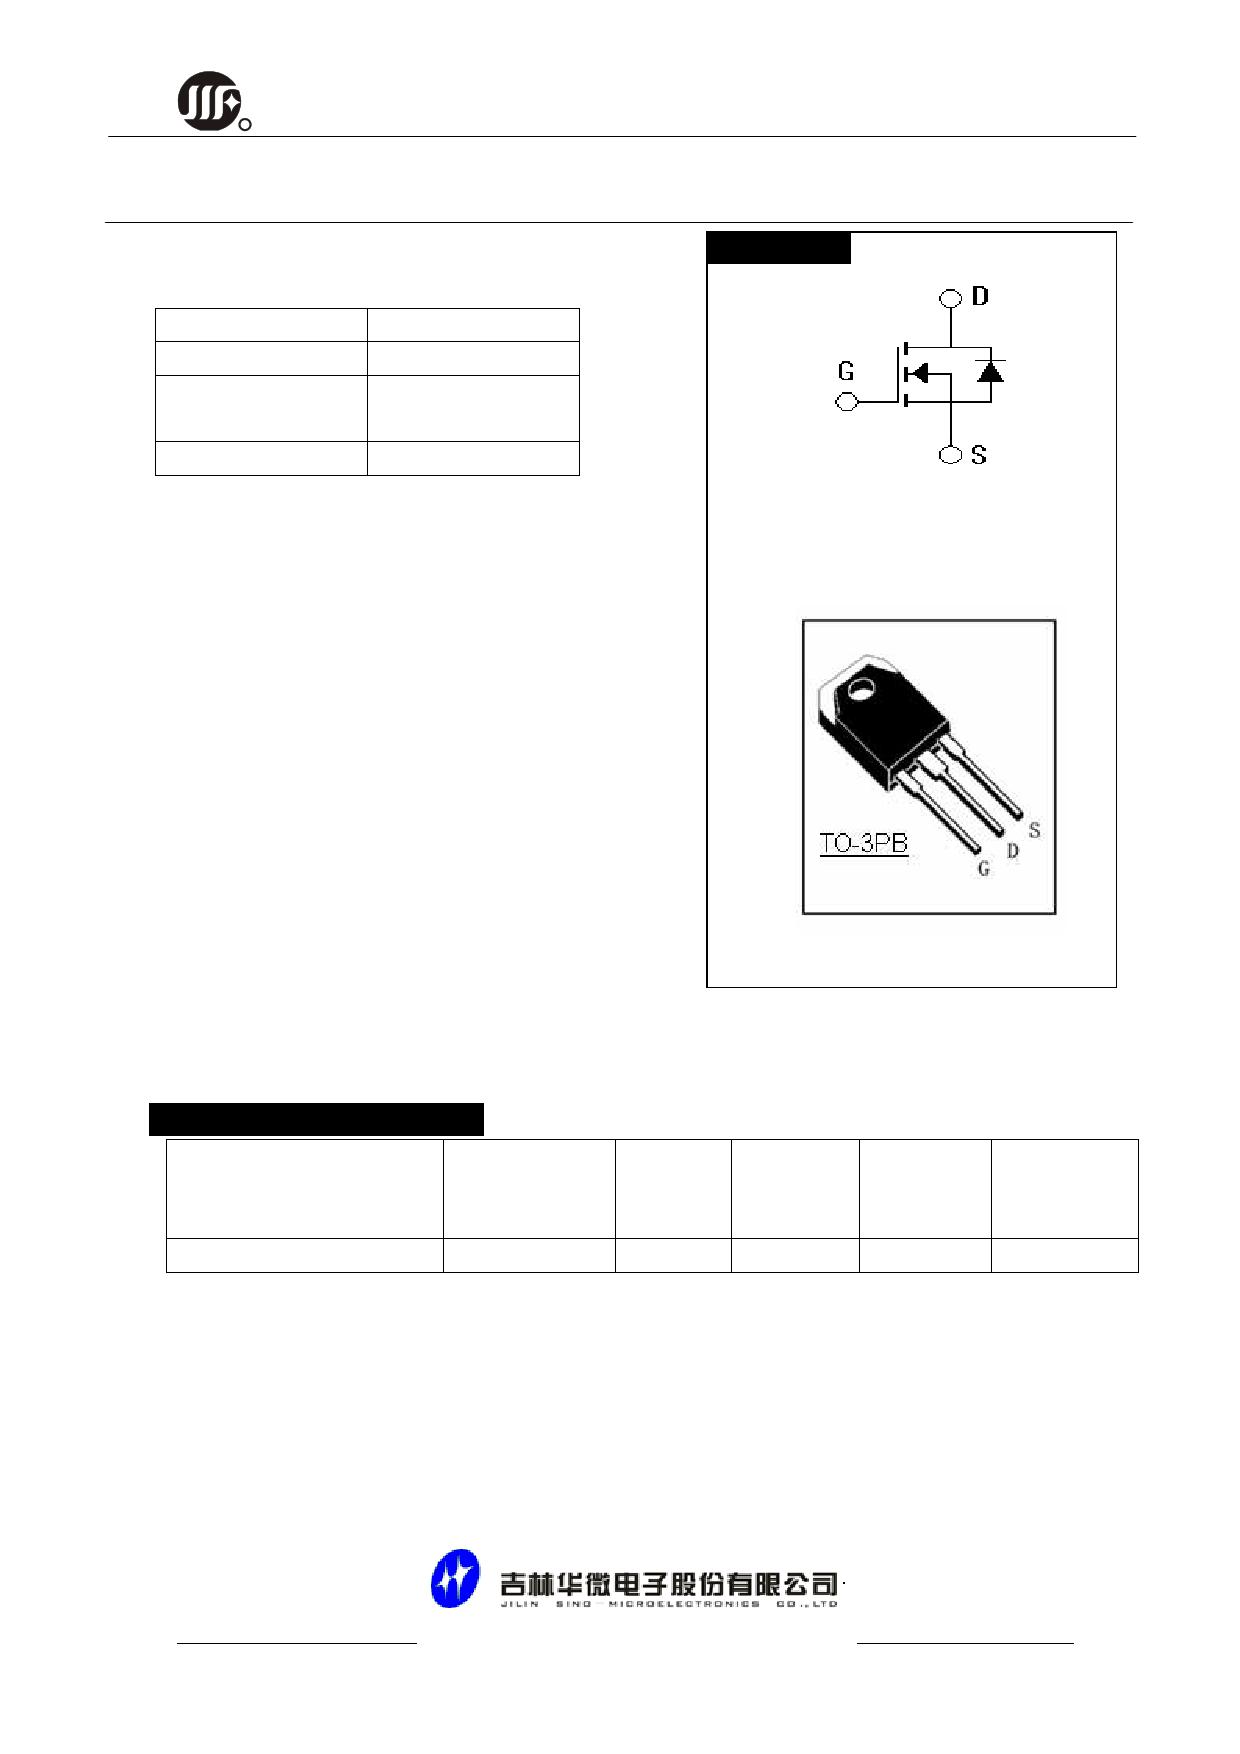 JCS65N20T datasheet